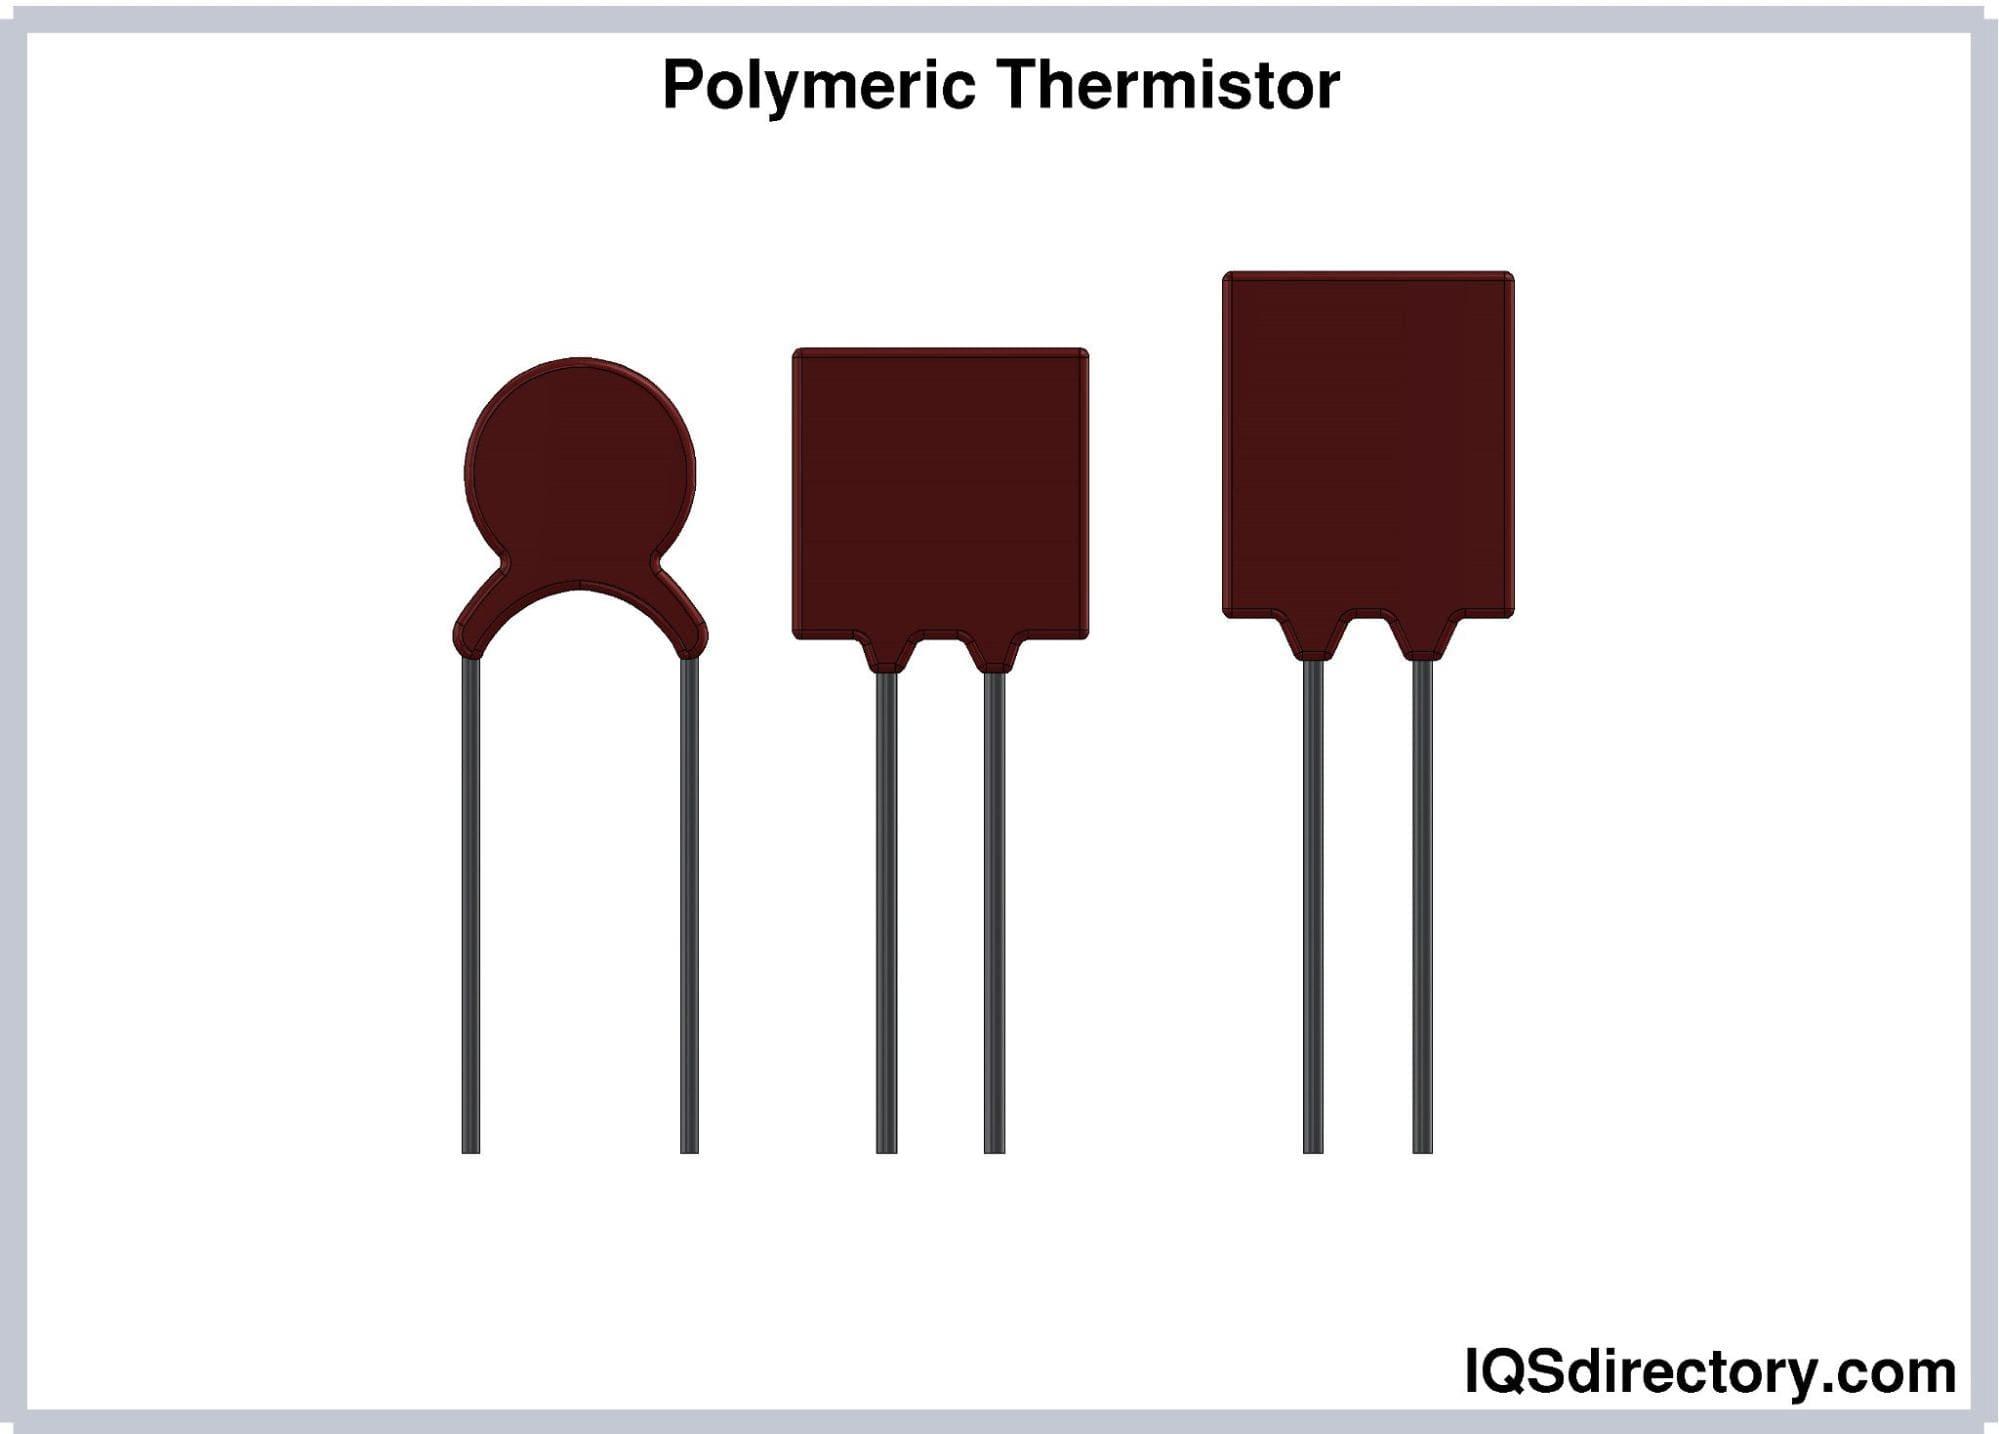 Polymeric Thermistor